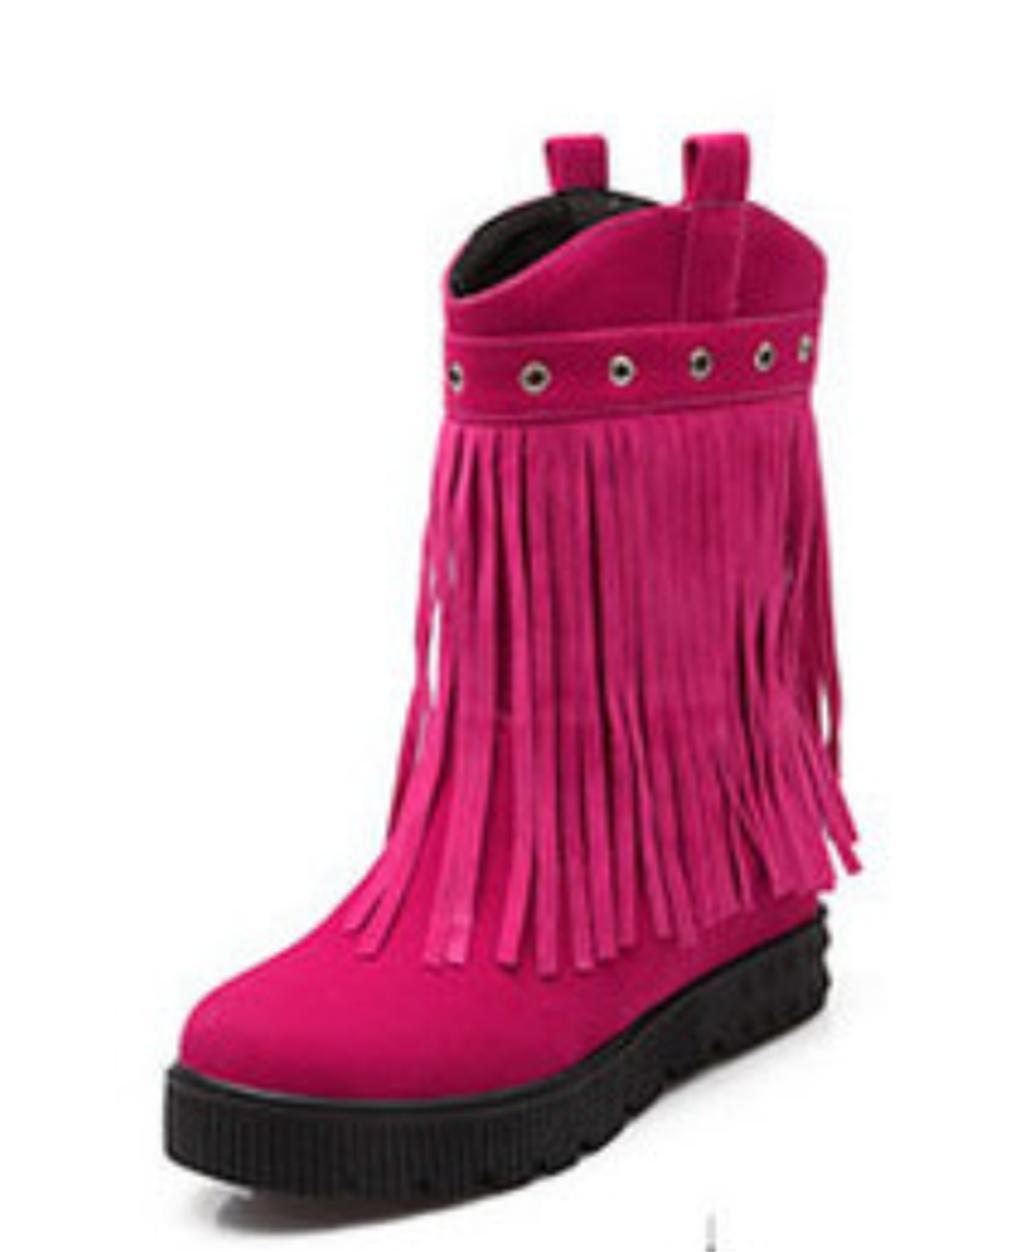 Kitzen Damen-Veloursleder Stiefel High Heel Pumps Quaste Runde Kopf Party Dress  38 EU Pink